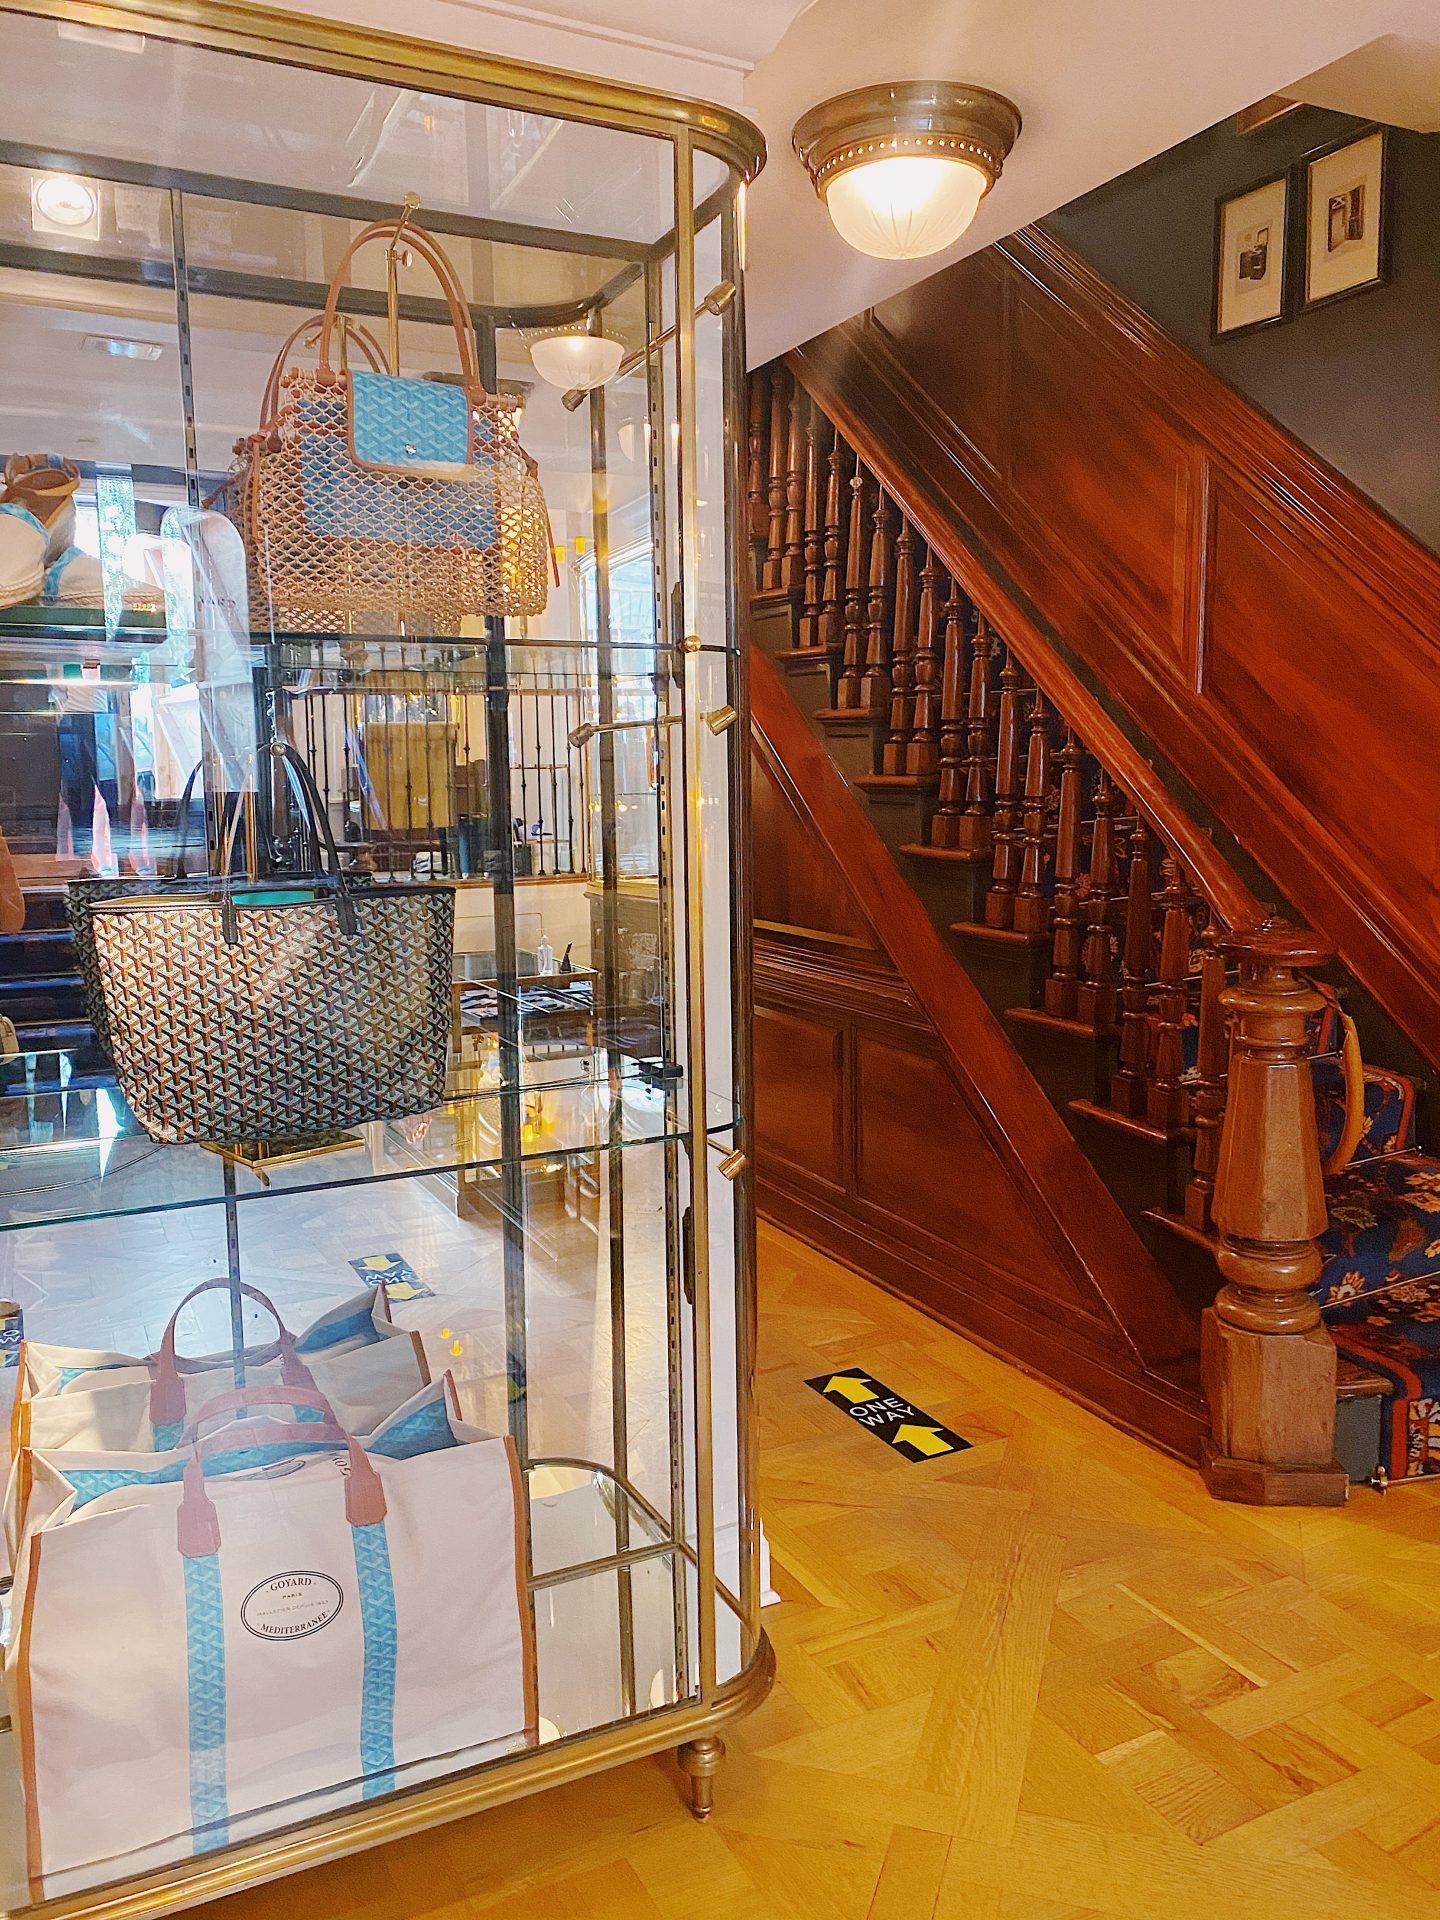 Goyard Store New York City